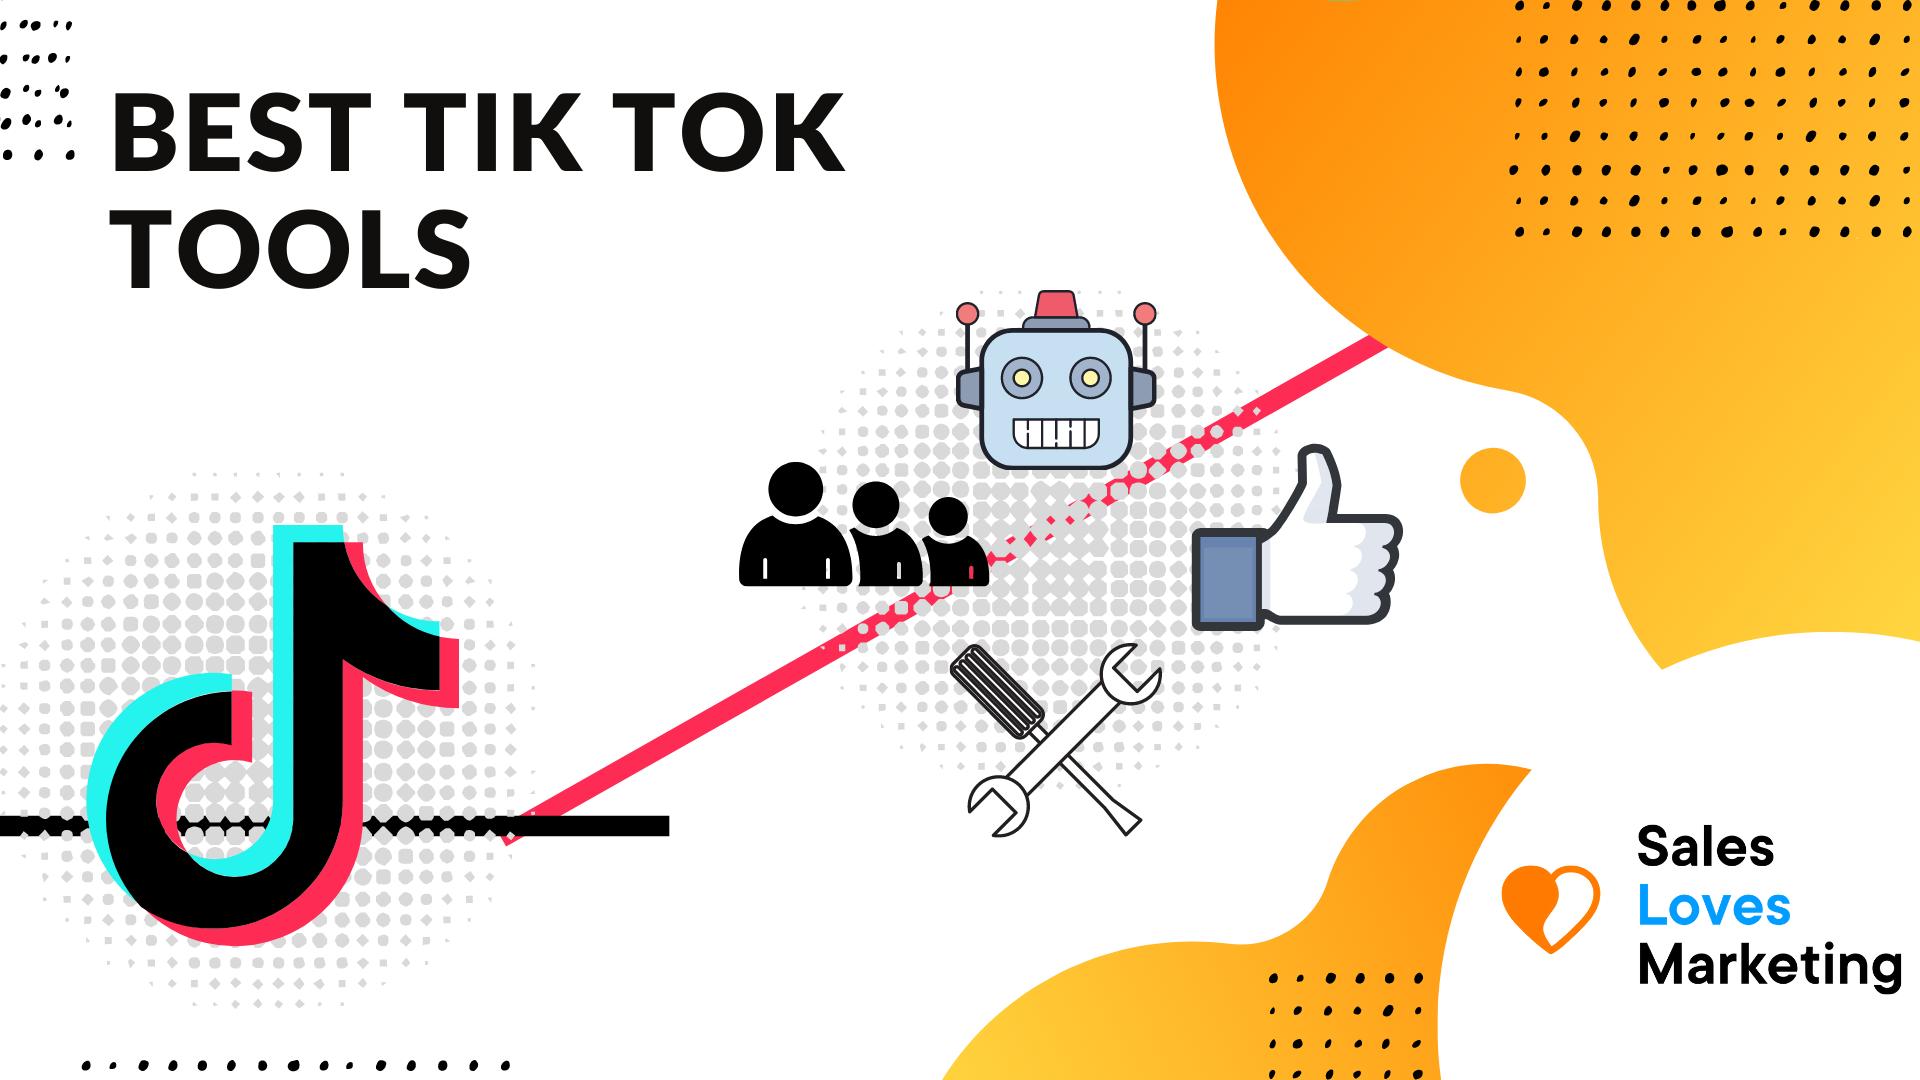 TikTok algorithms and how they work